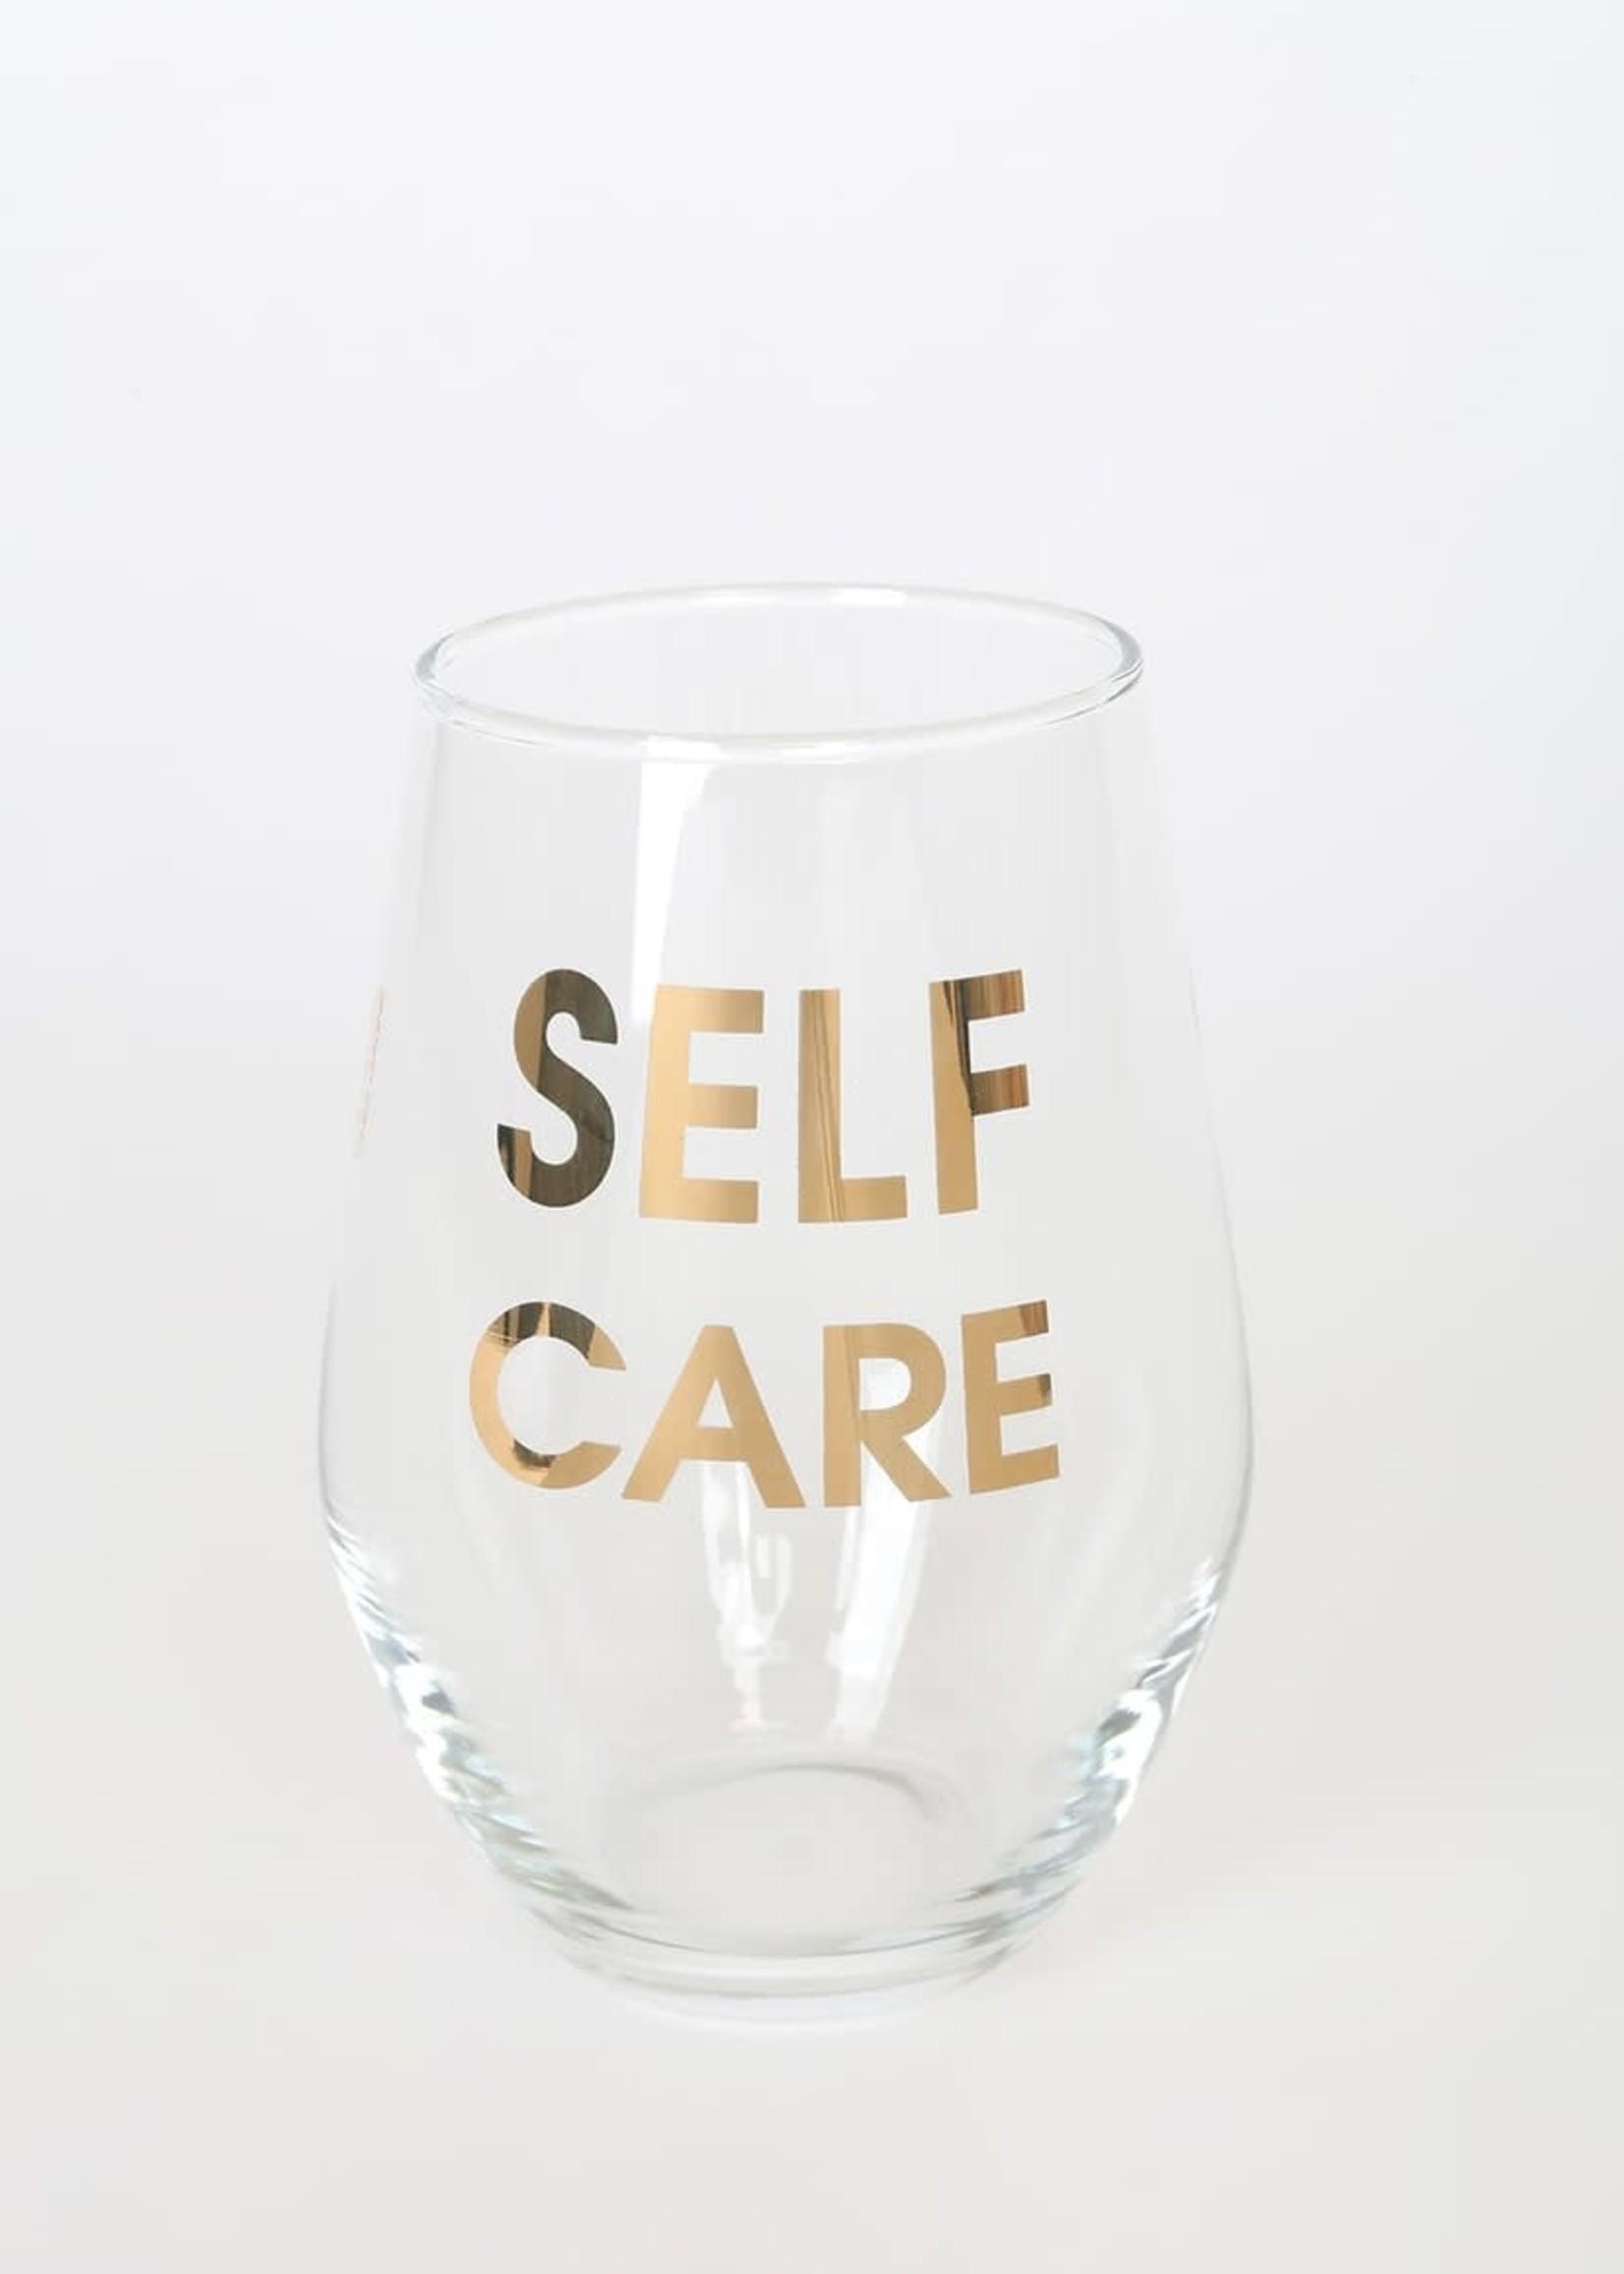 CHEZ GANGE CHEZ GAGNE WINE GLASS - SELF CARE